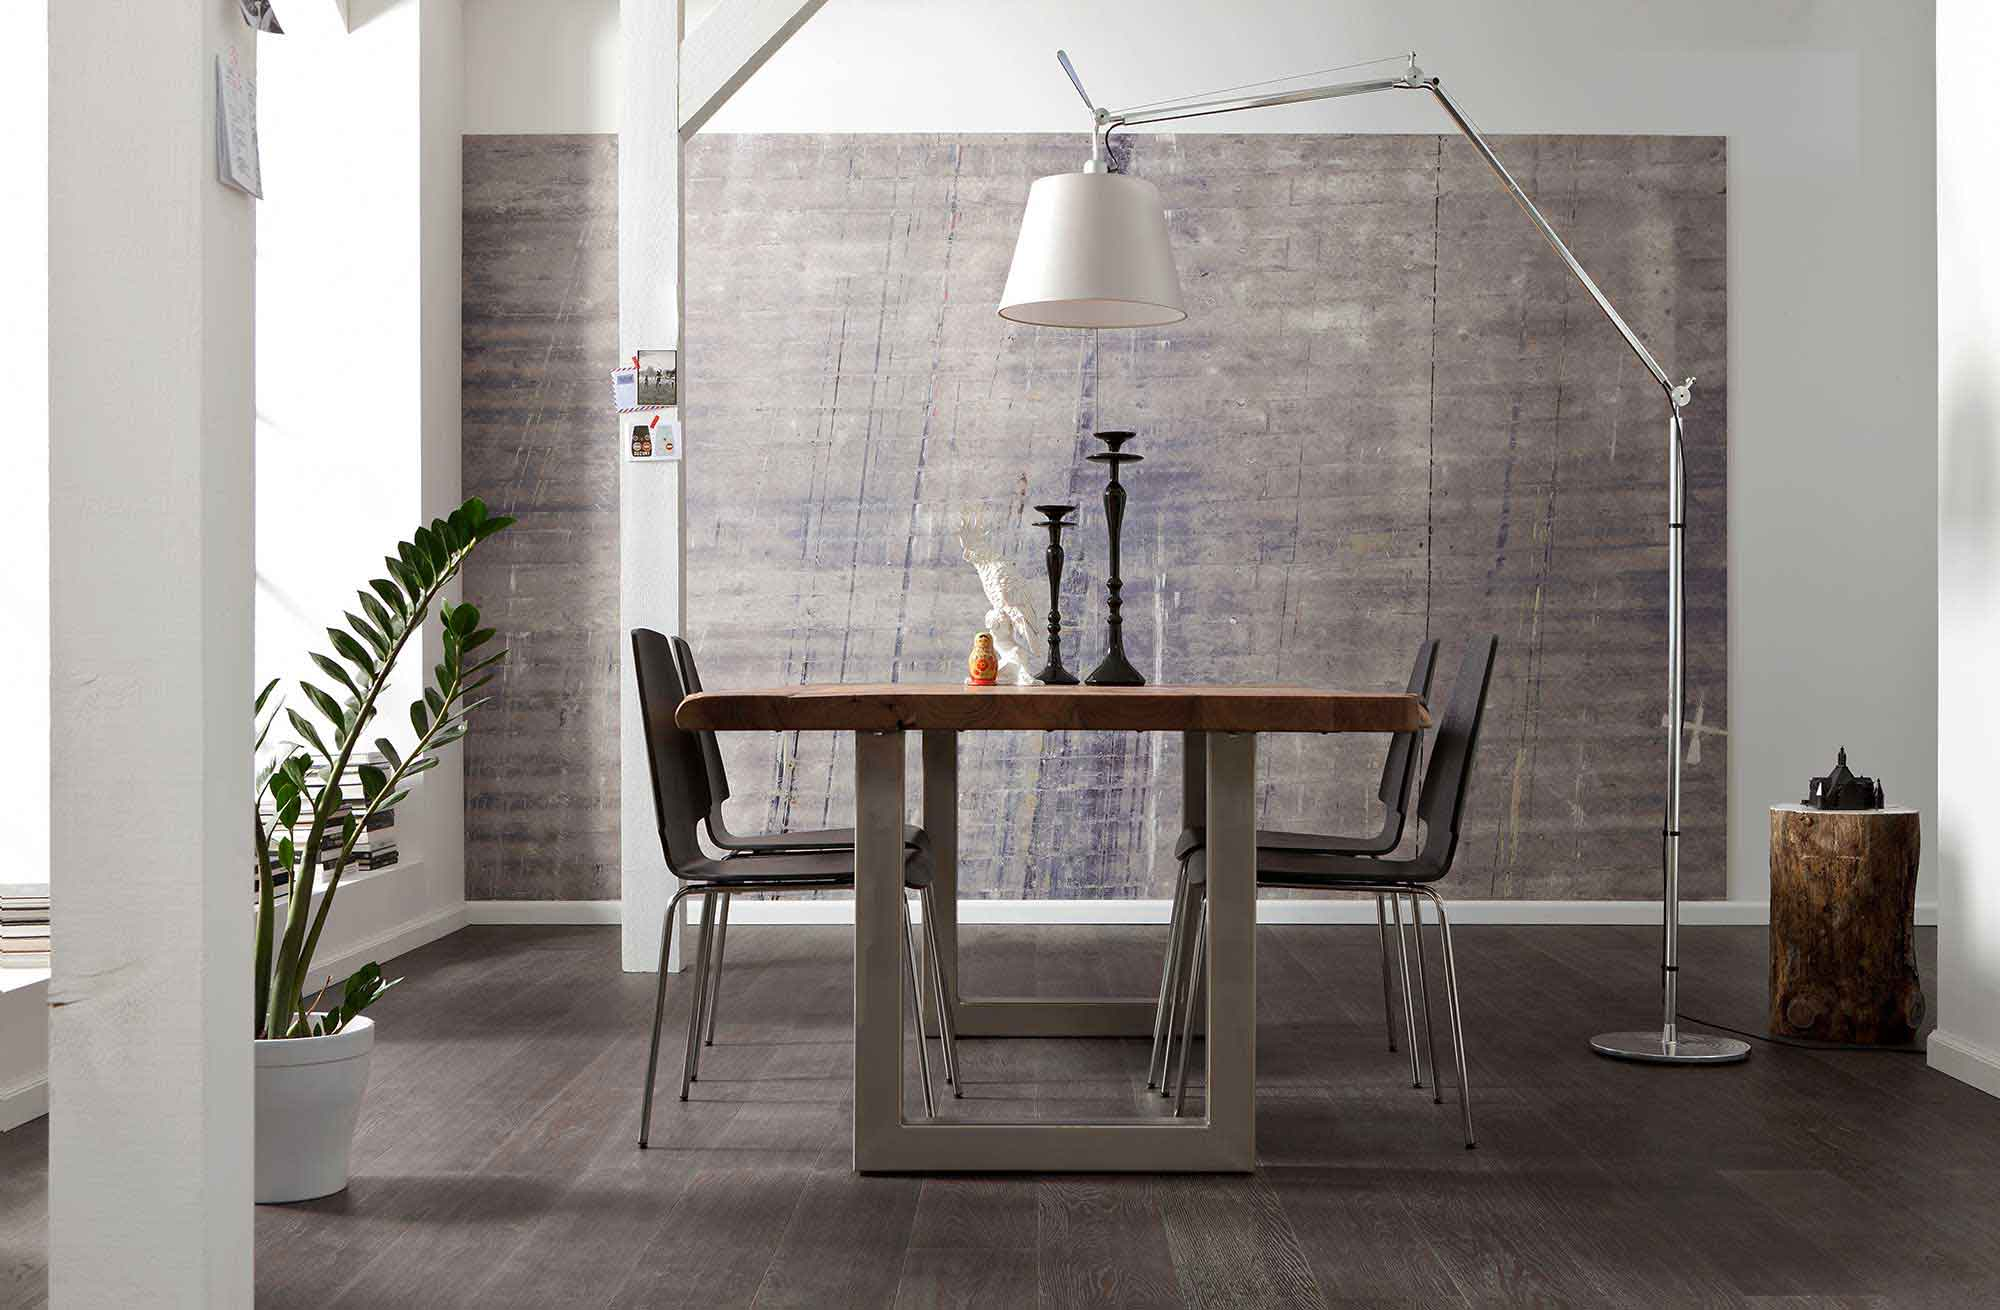 vlies fototapete beton optik vlies fototapeten. Black Bedroom Furniture Sets. Home Design Ideas